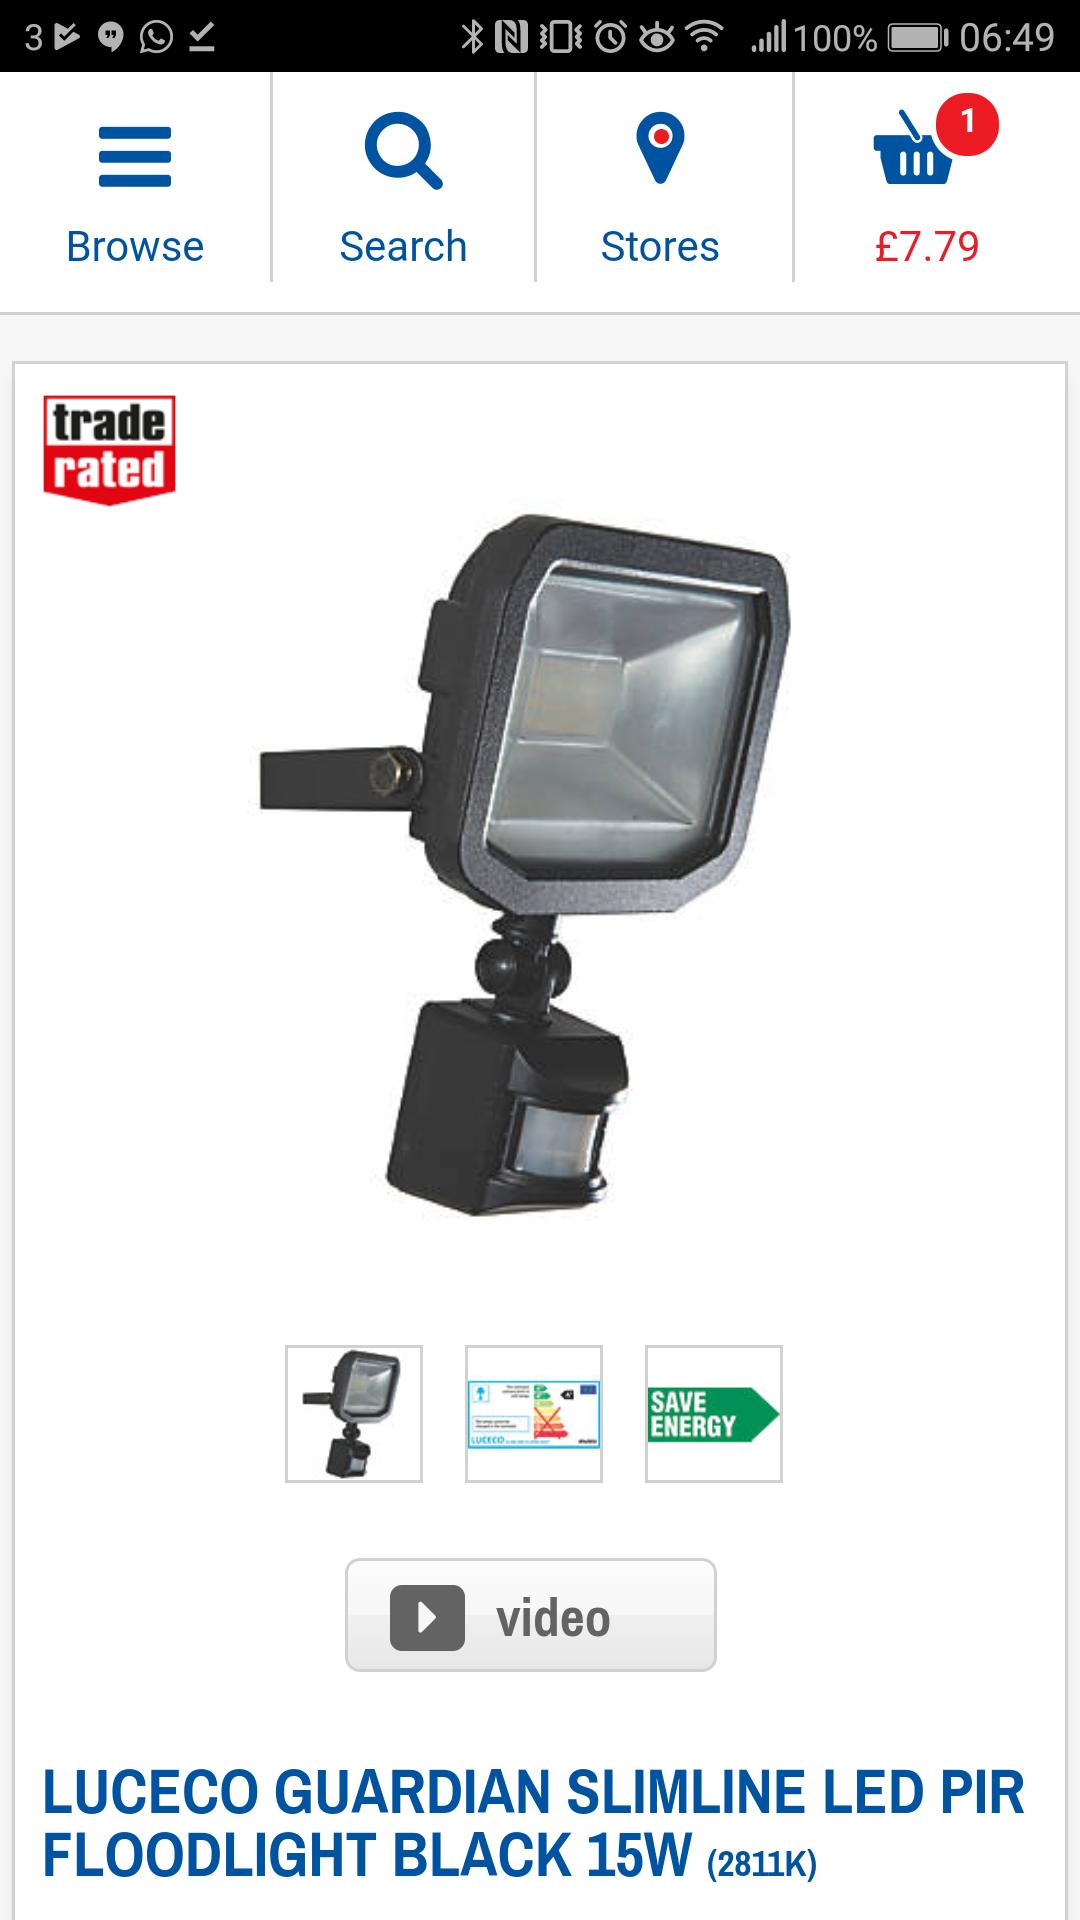 LED Floodlight 15W - £7.79 from Screwfix (Warm White)